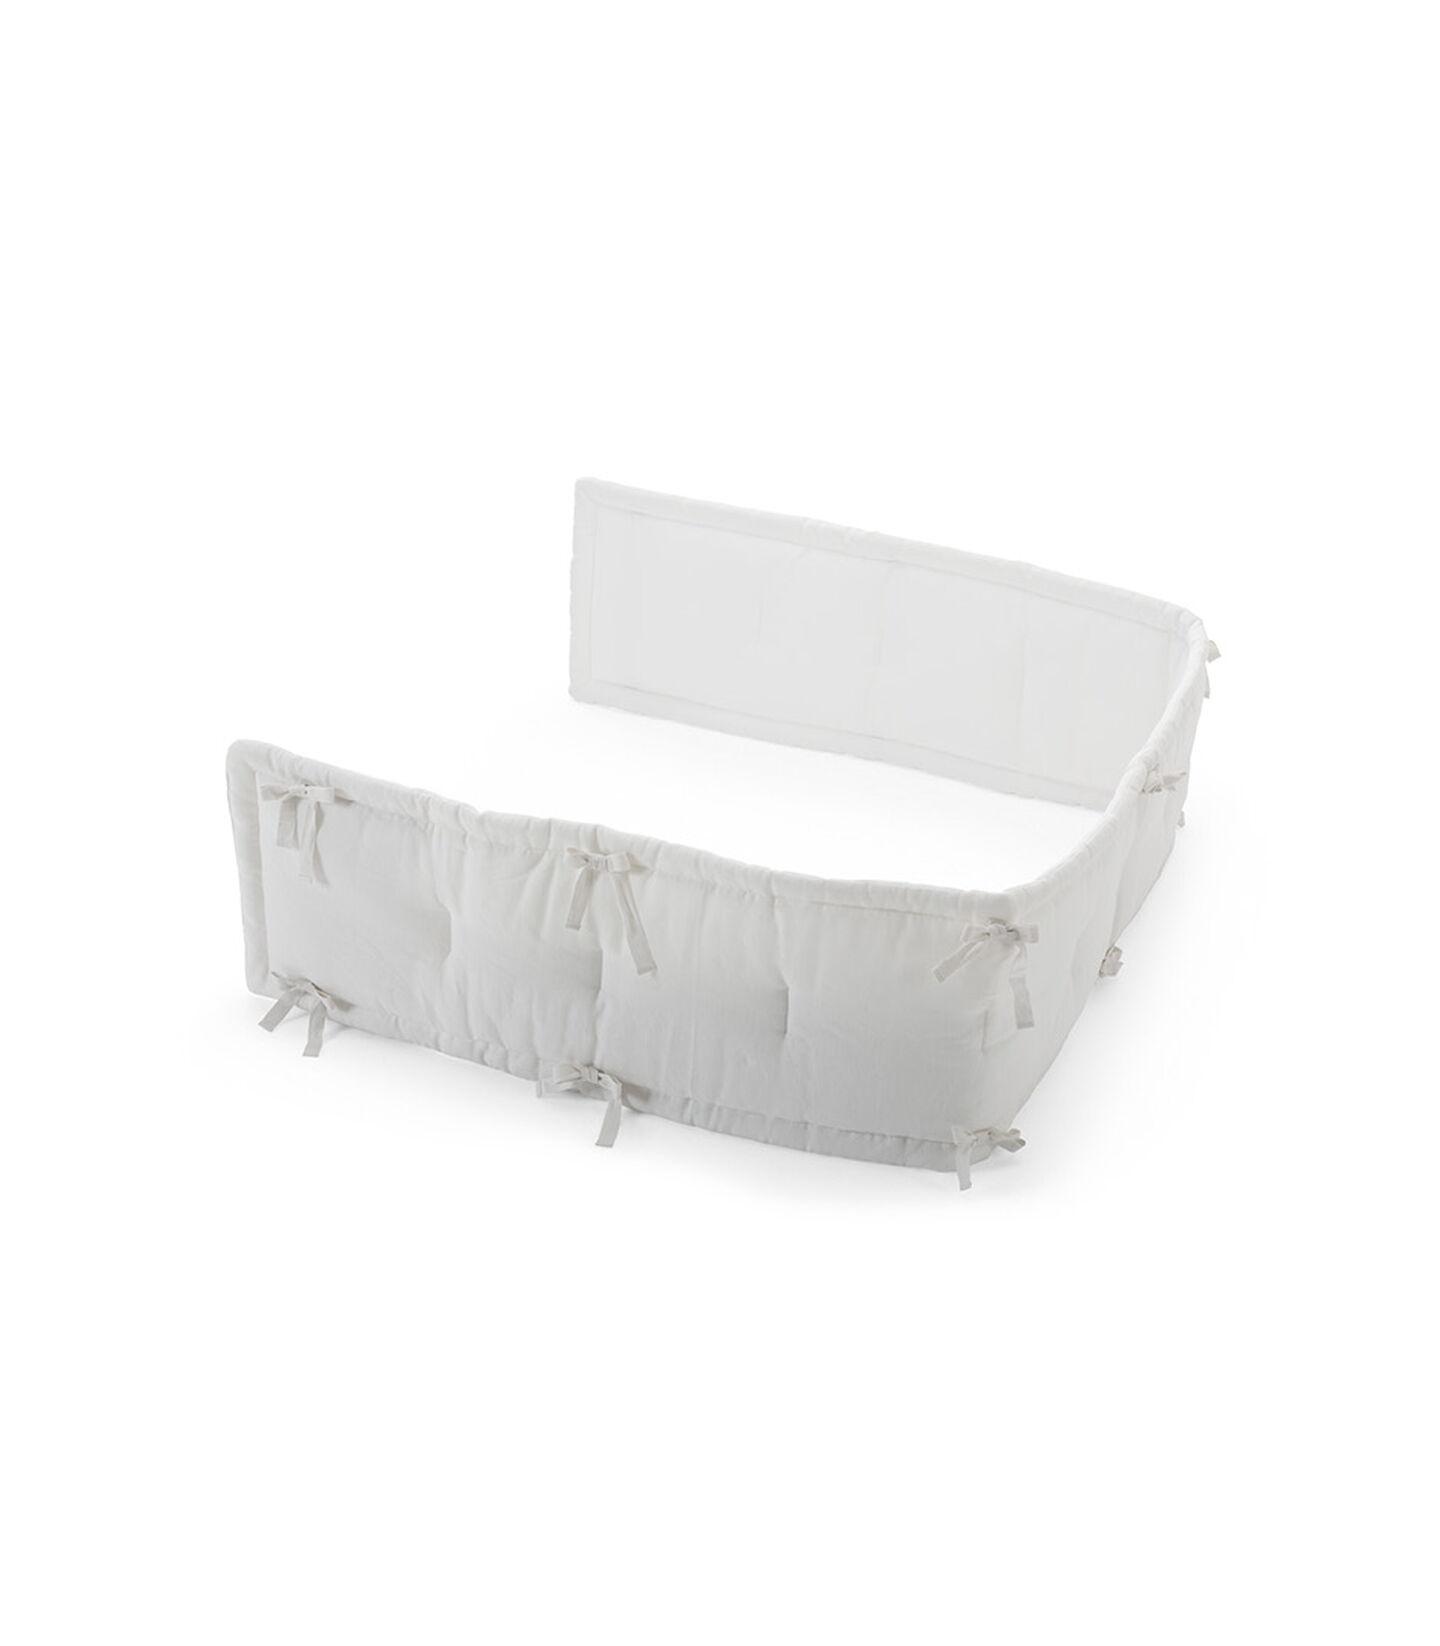 Stokke® Half Bumper, Linen White. view 1